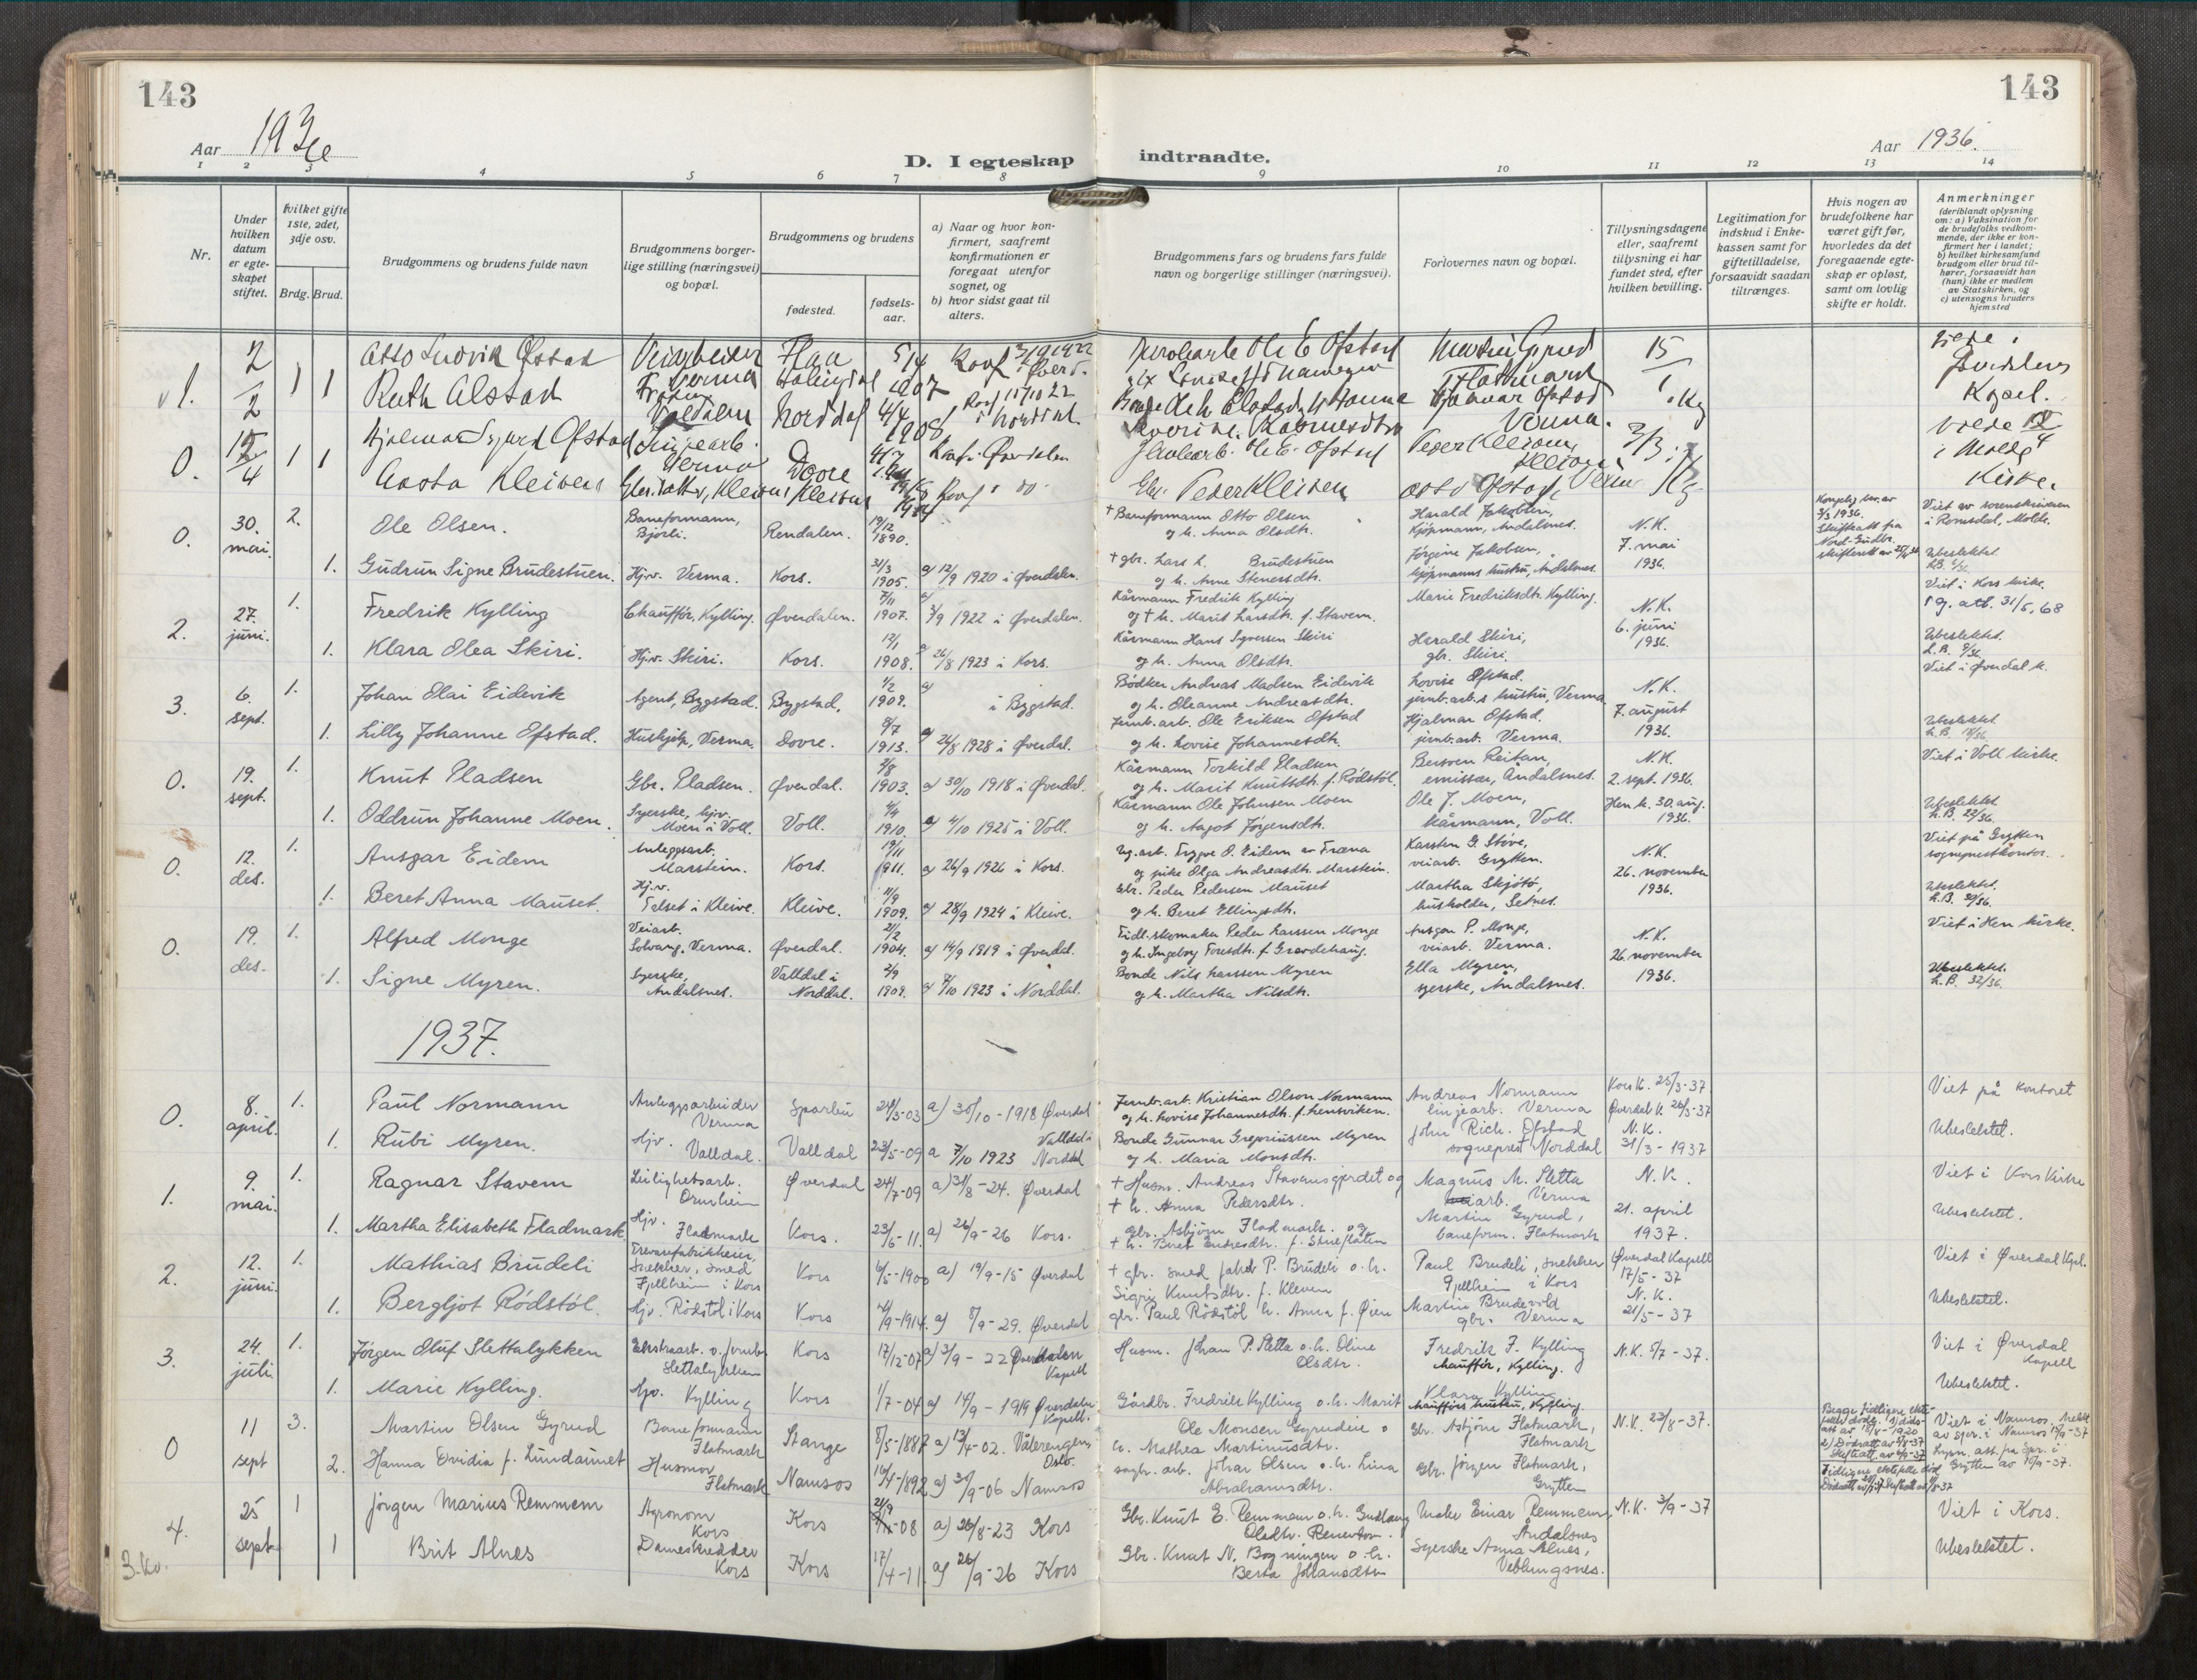 SAT, Grytten sokneprestkontor, Ministerialbok nr. 546A04, 1919-1956, s. 143